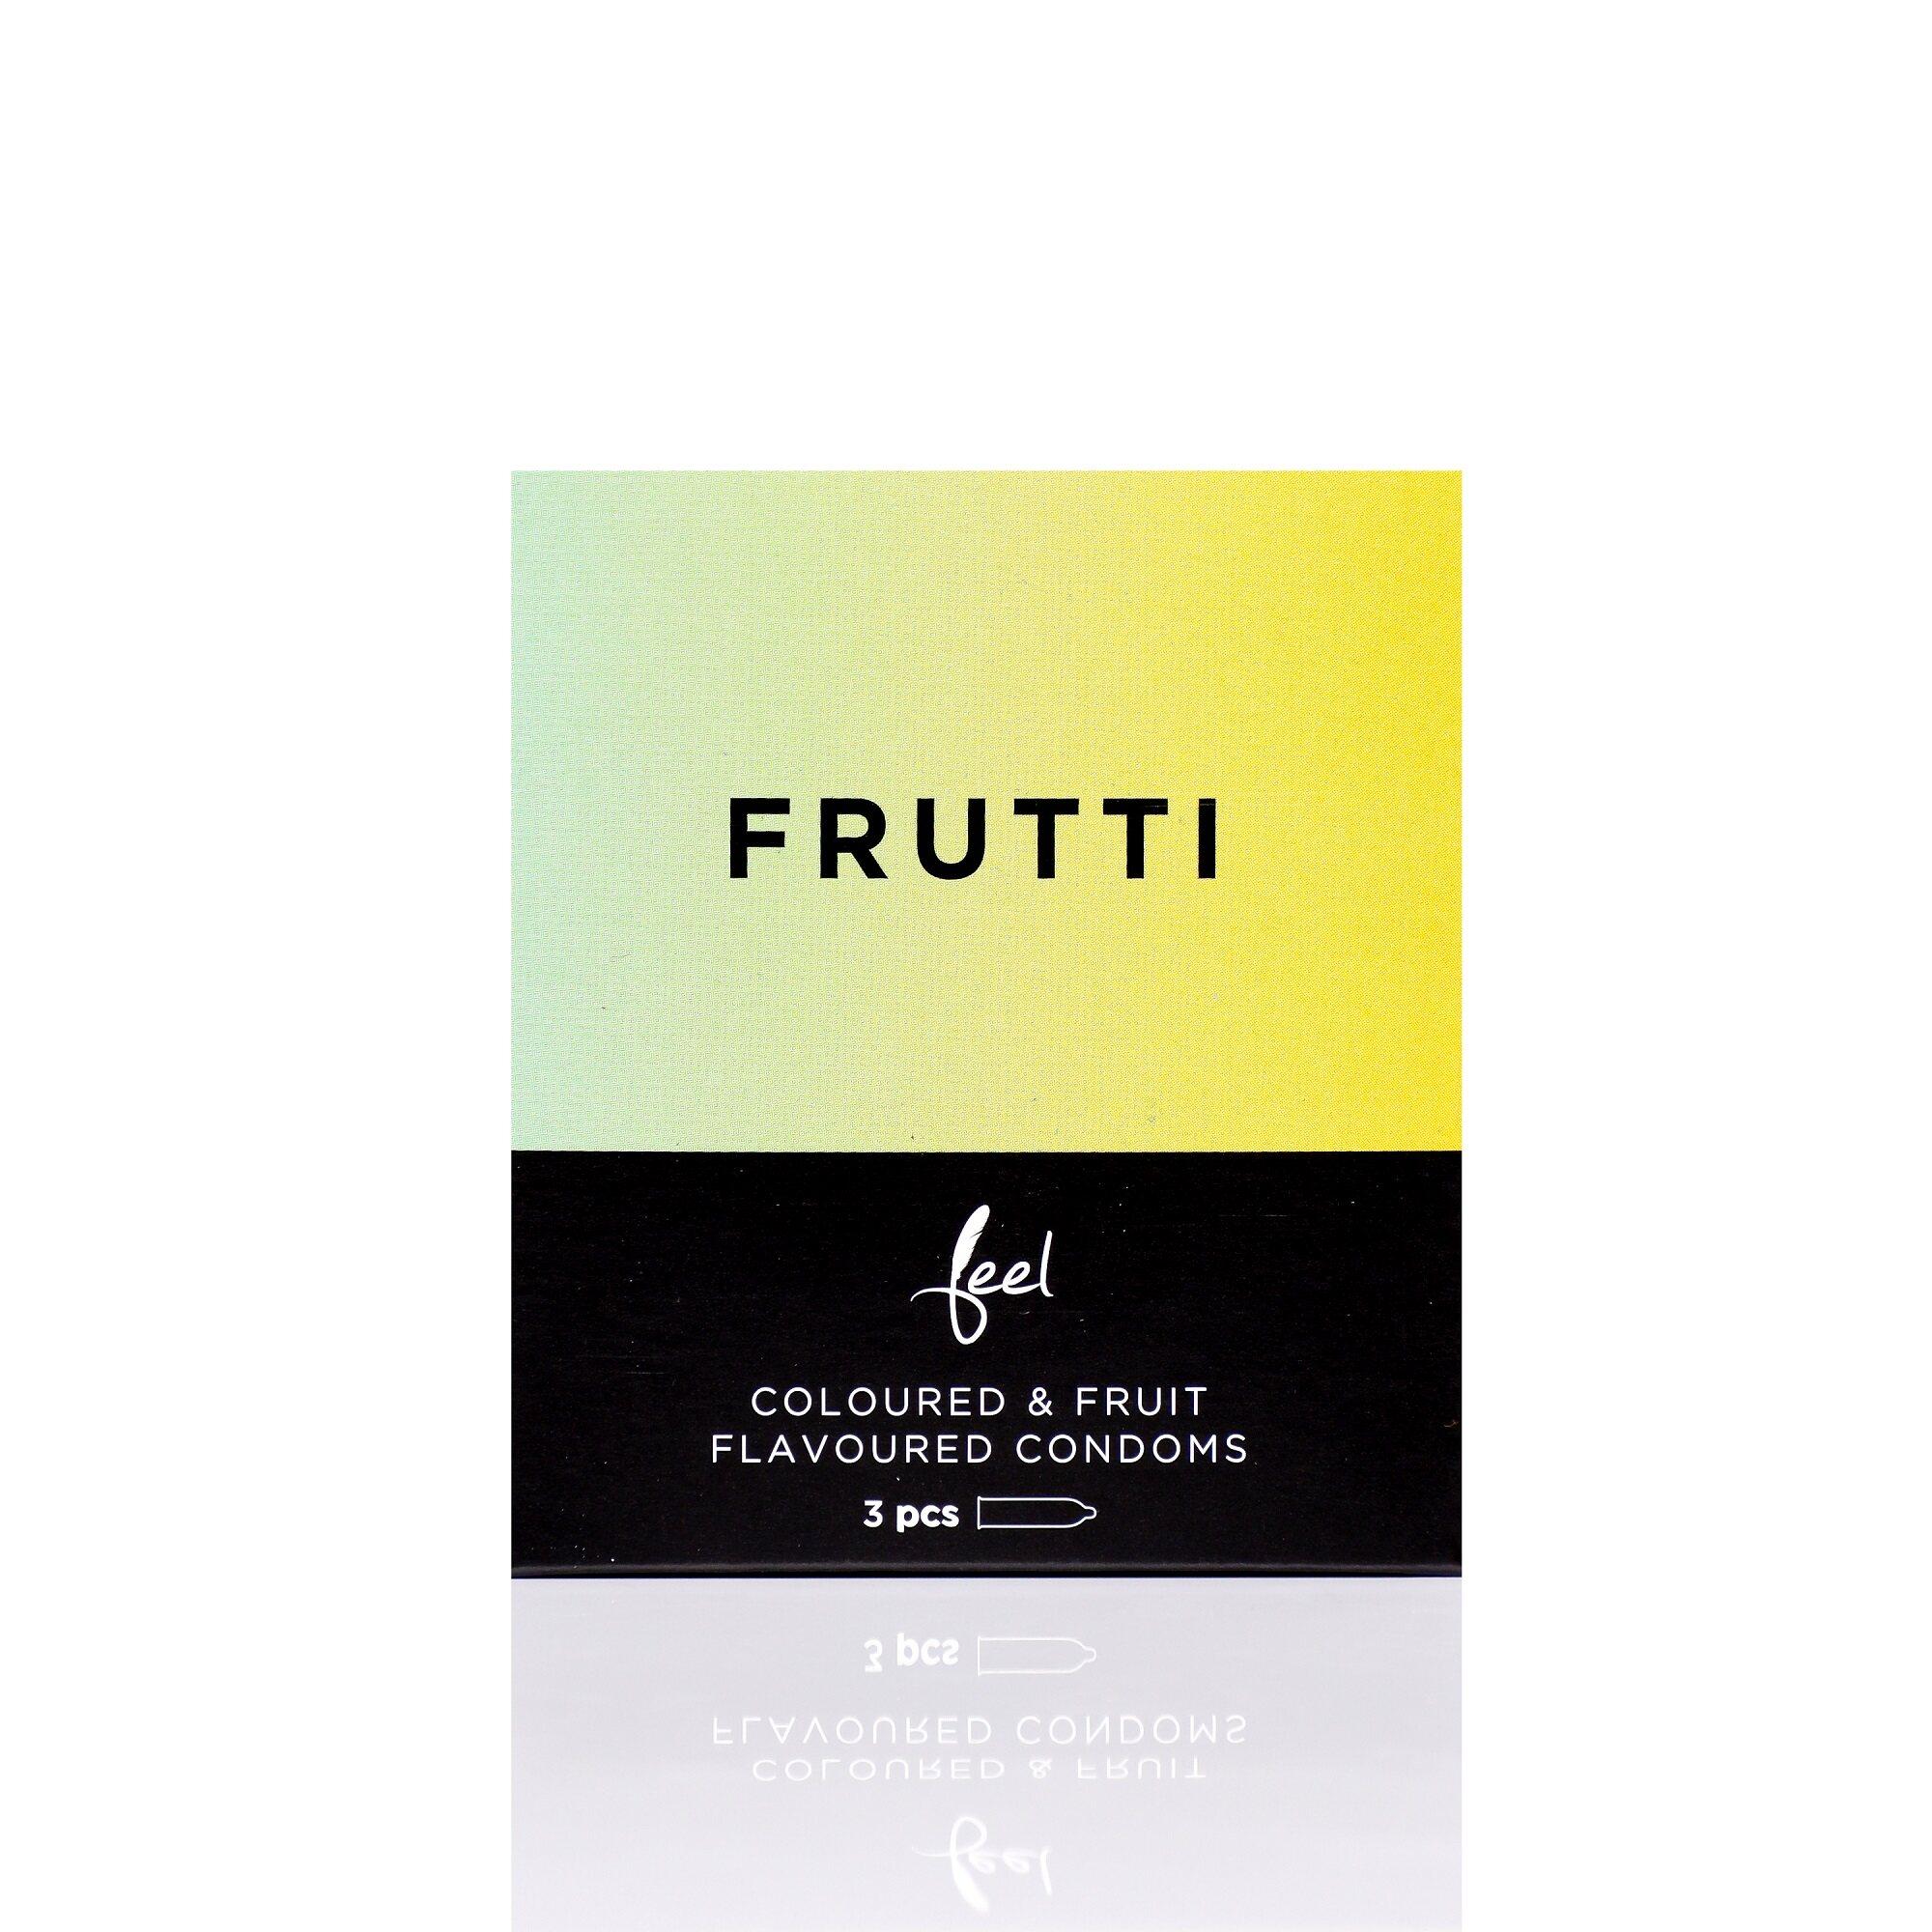 Nulatex Feel Frutti Coloured & Fruit Flavoured Condoms 3pcs